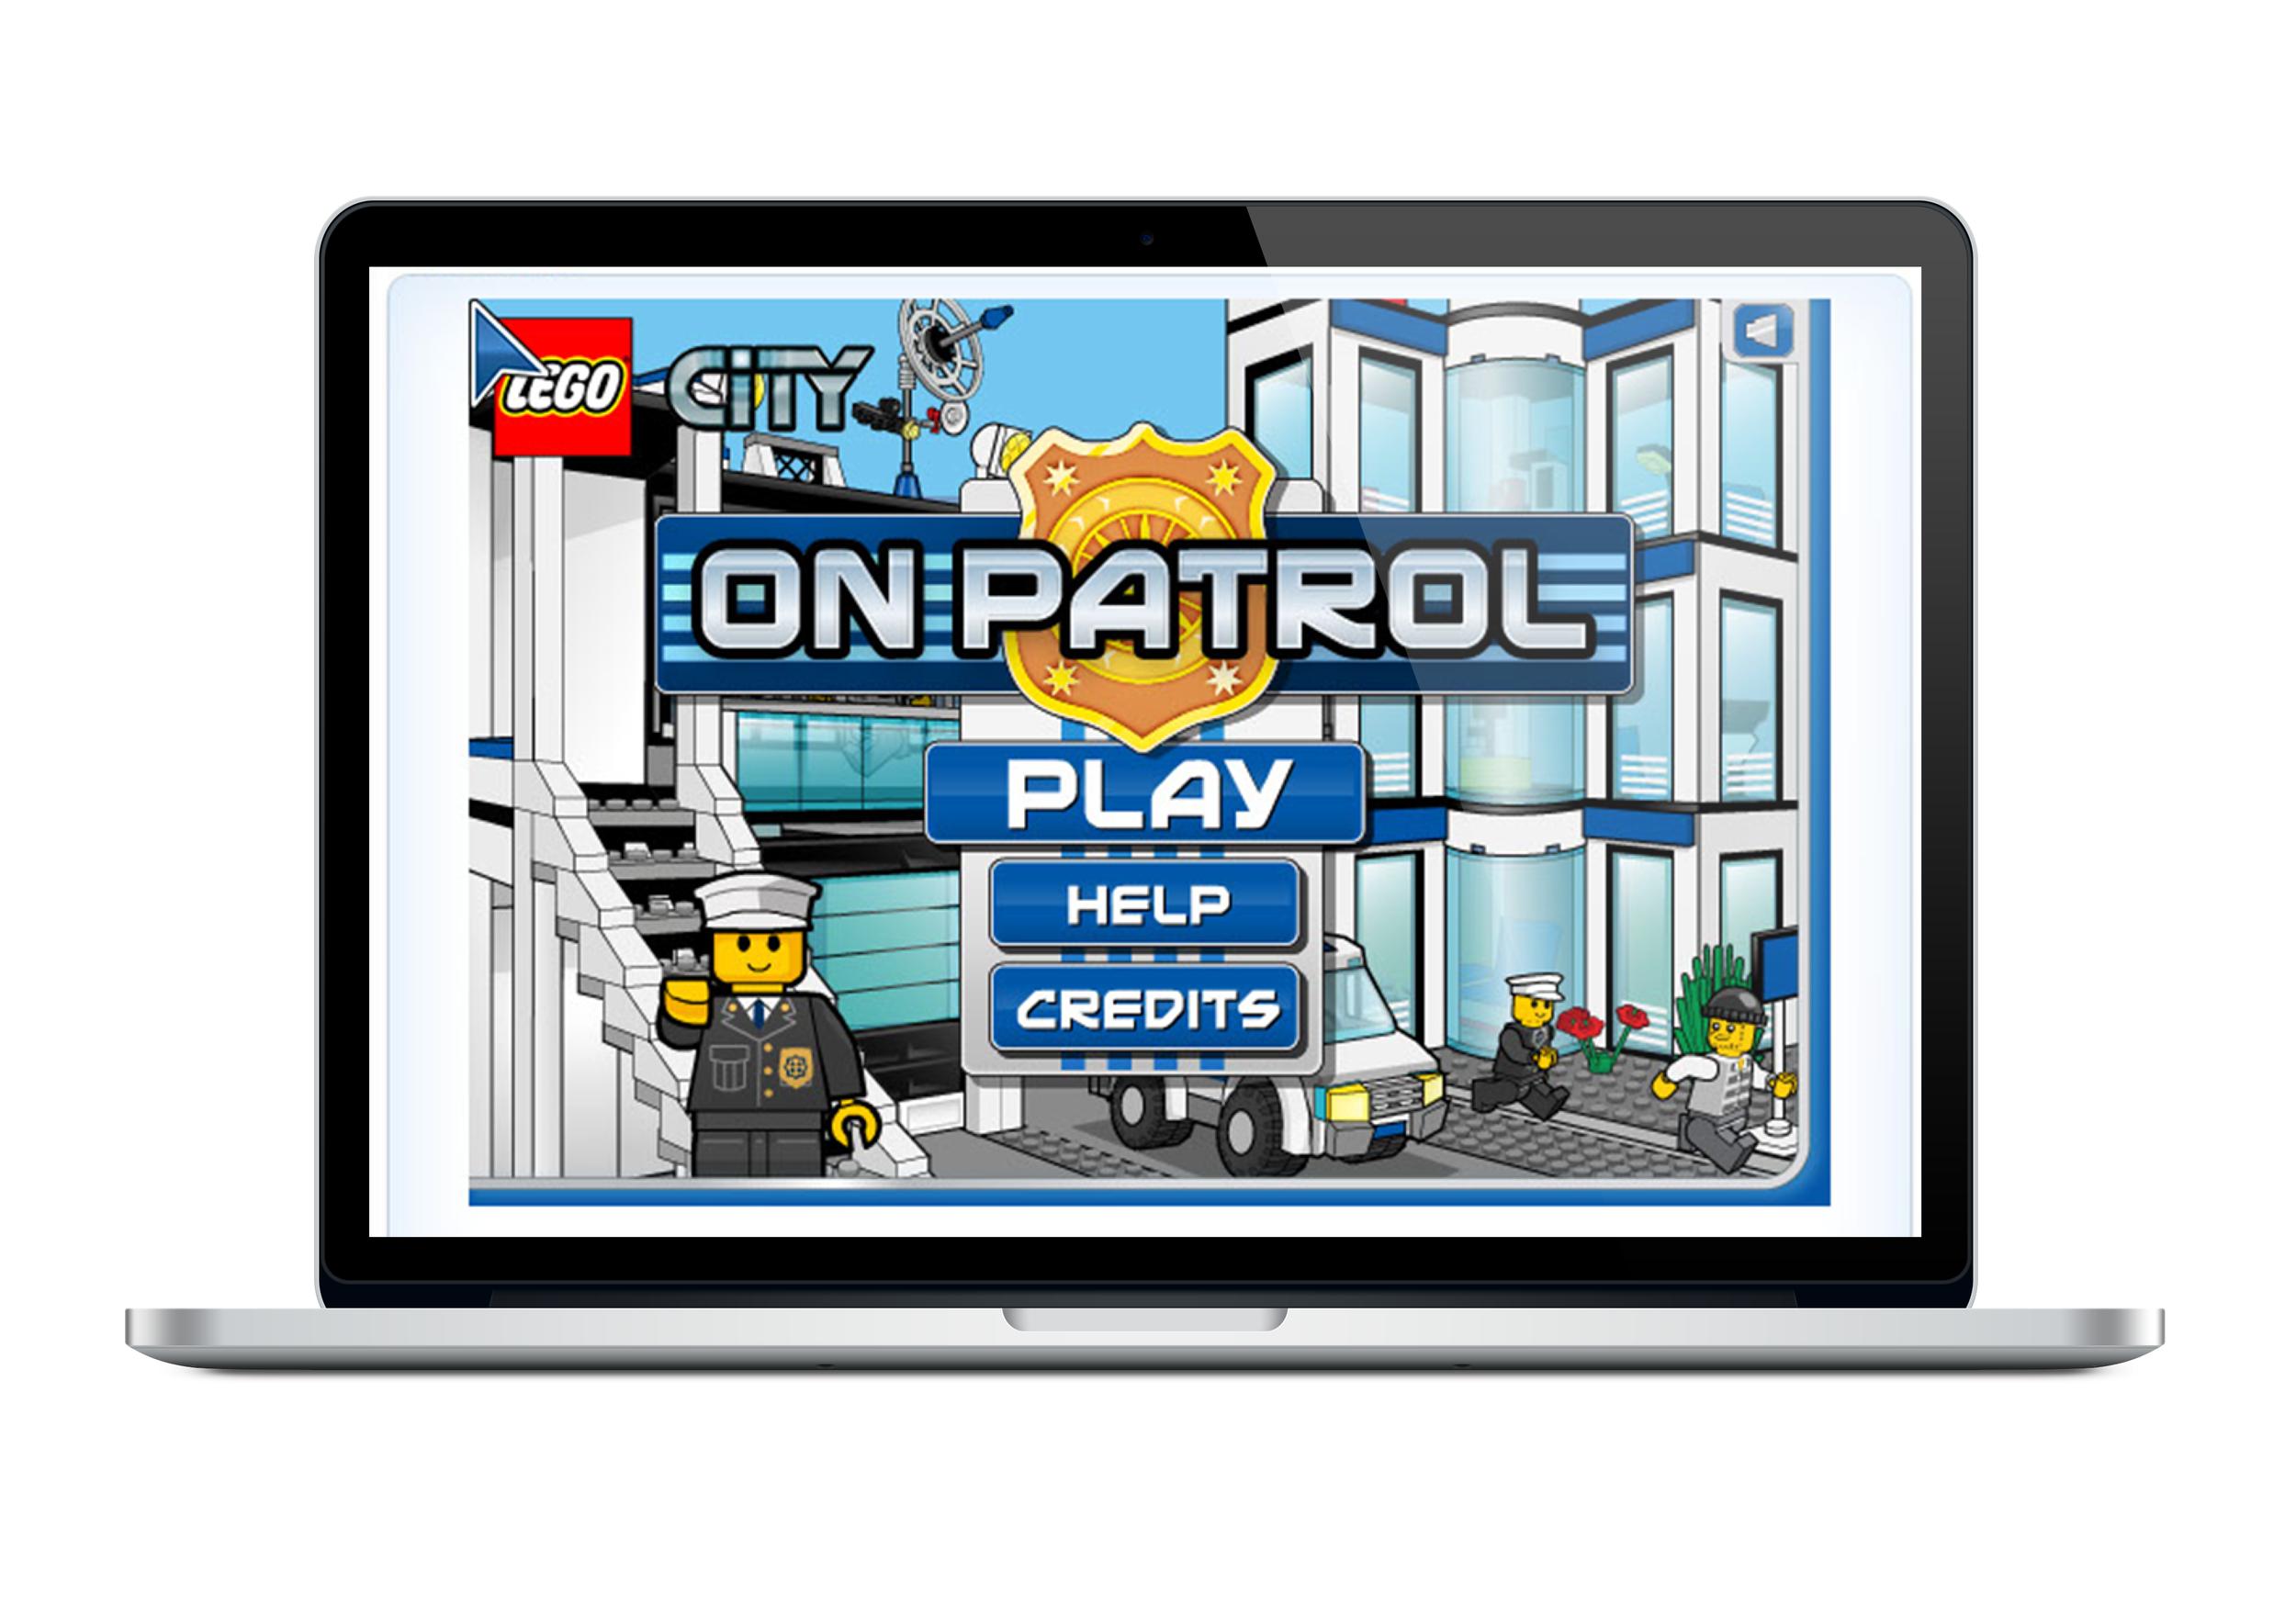 LEGO CITY ON PATROL Home Screen